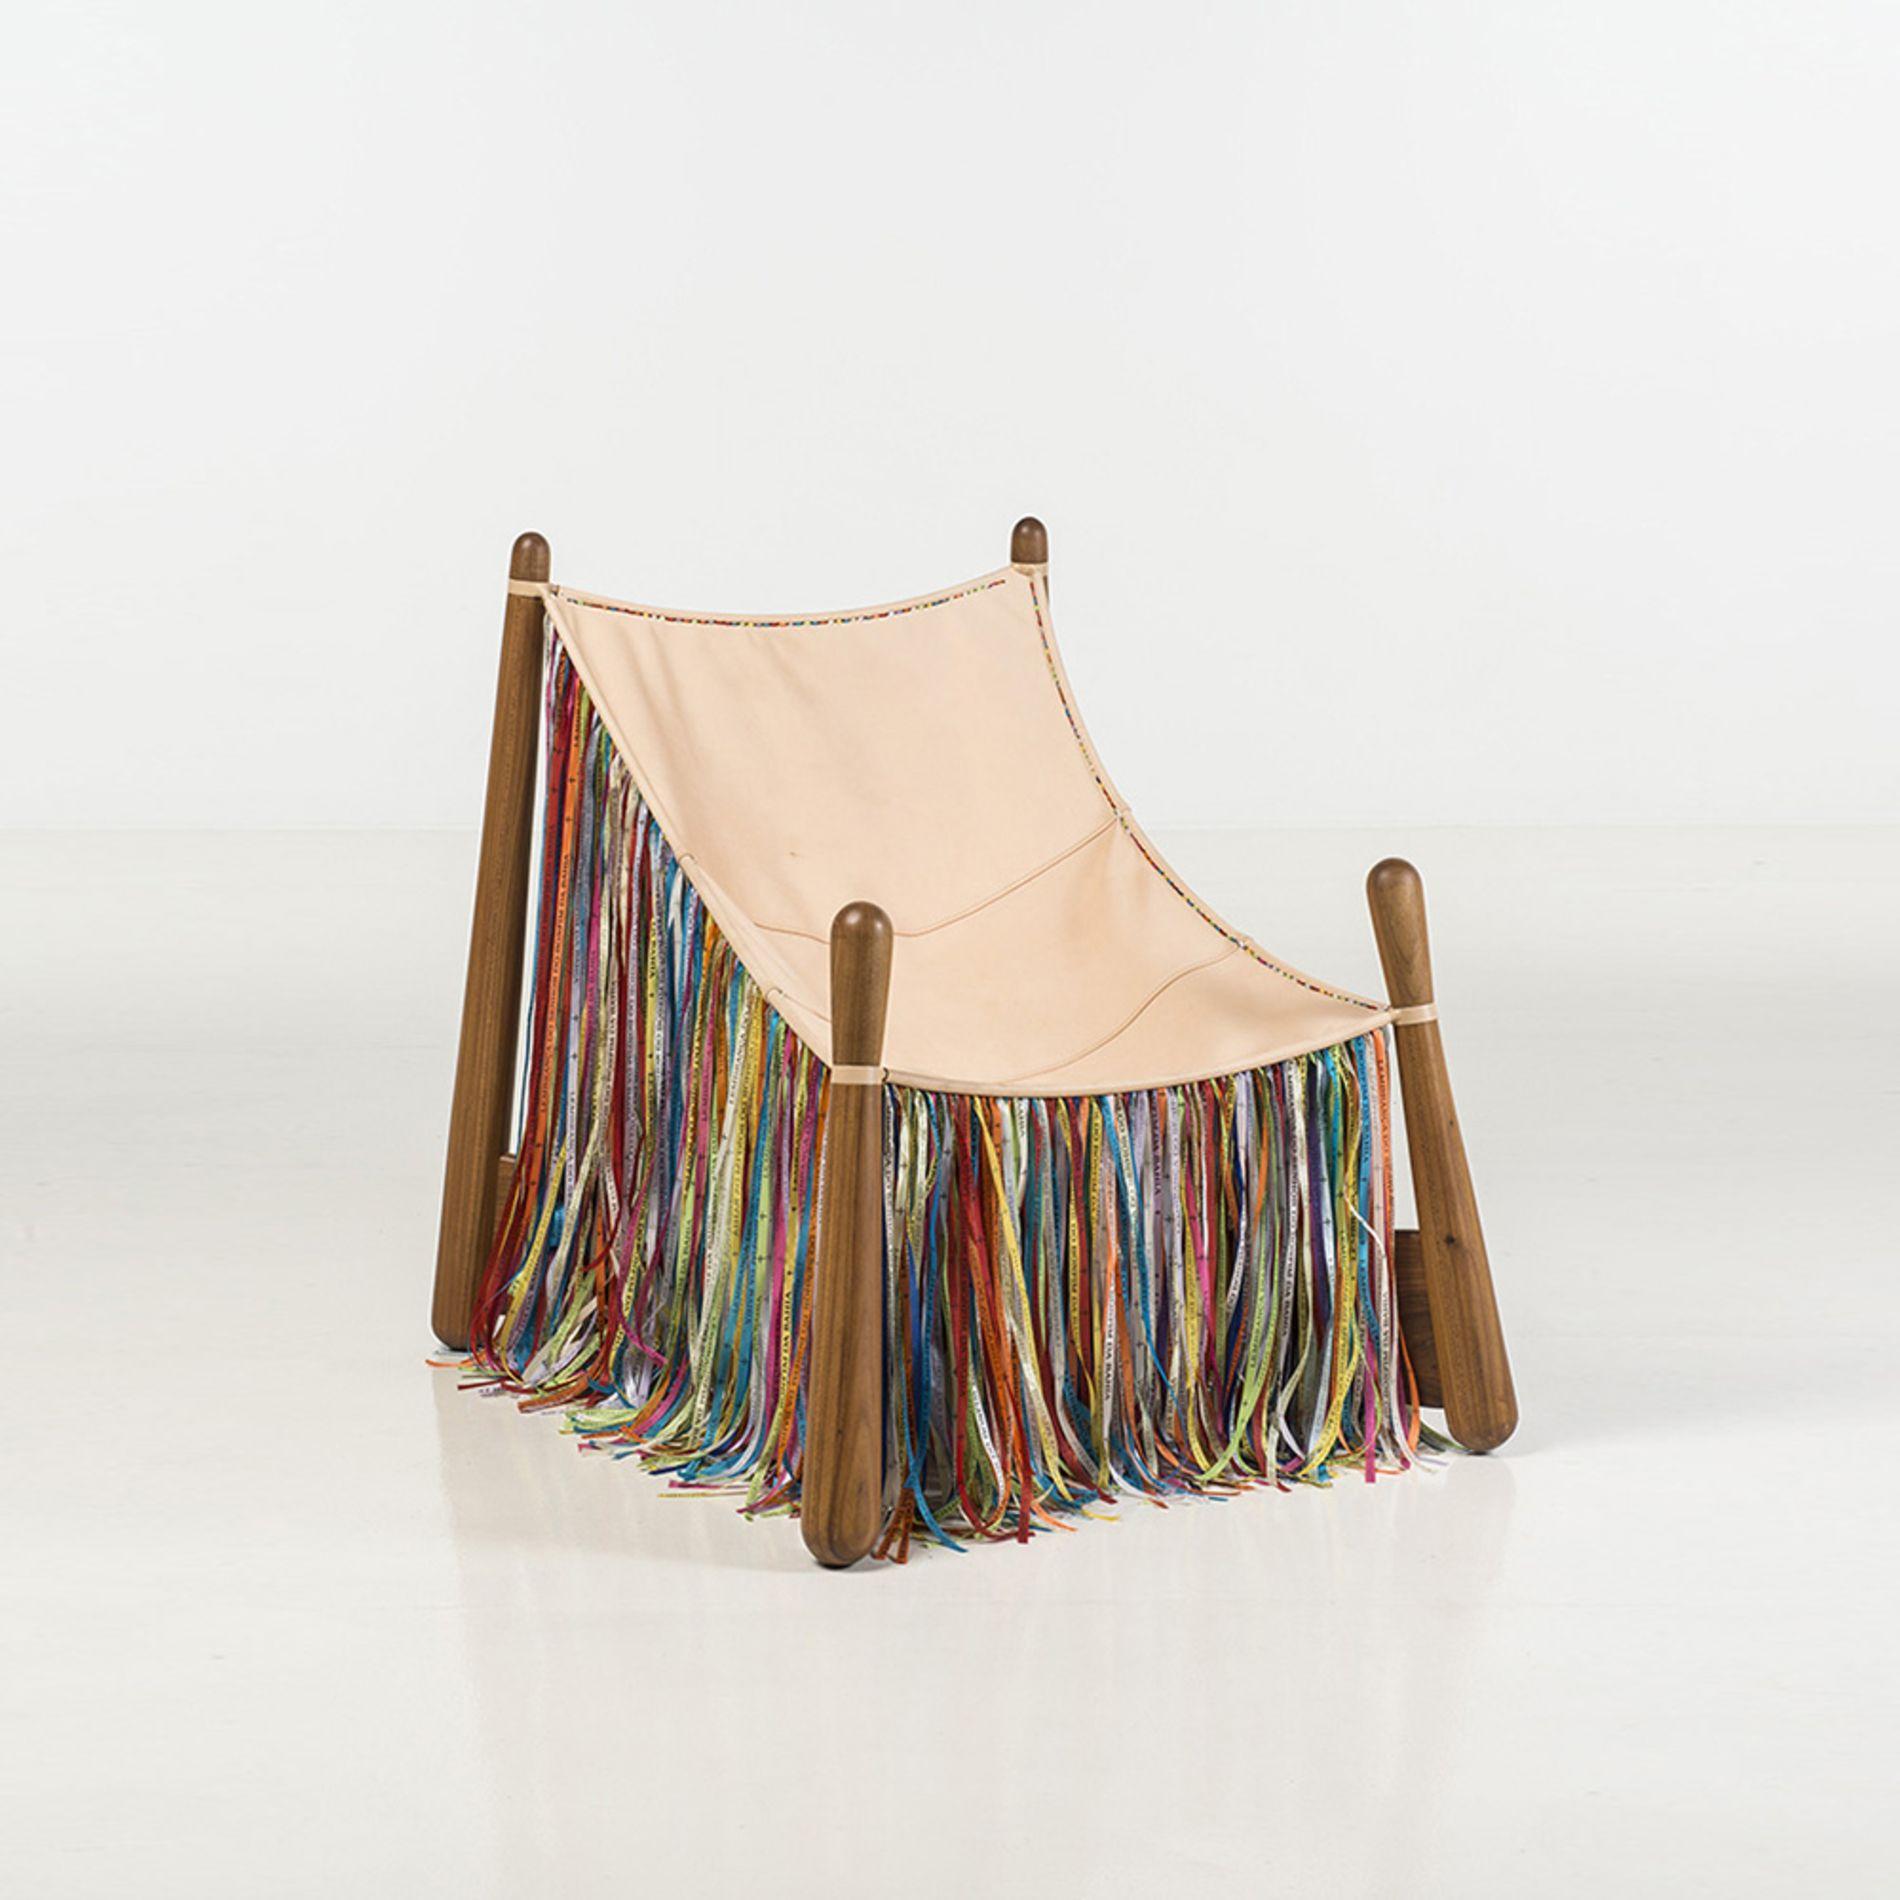 Alfo lisi 39 poltrona bonfim 39 chair 2015 chaired for Mobilia furniture hire